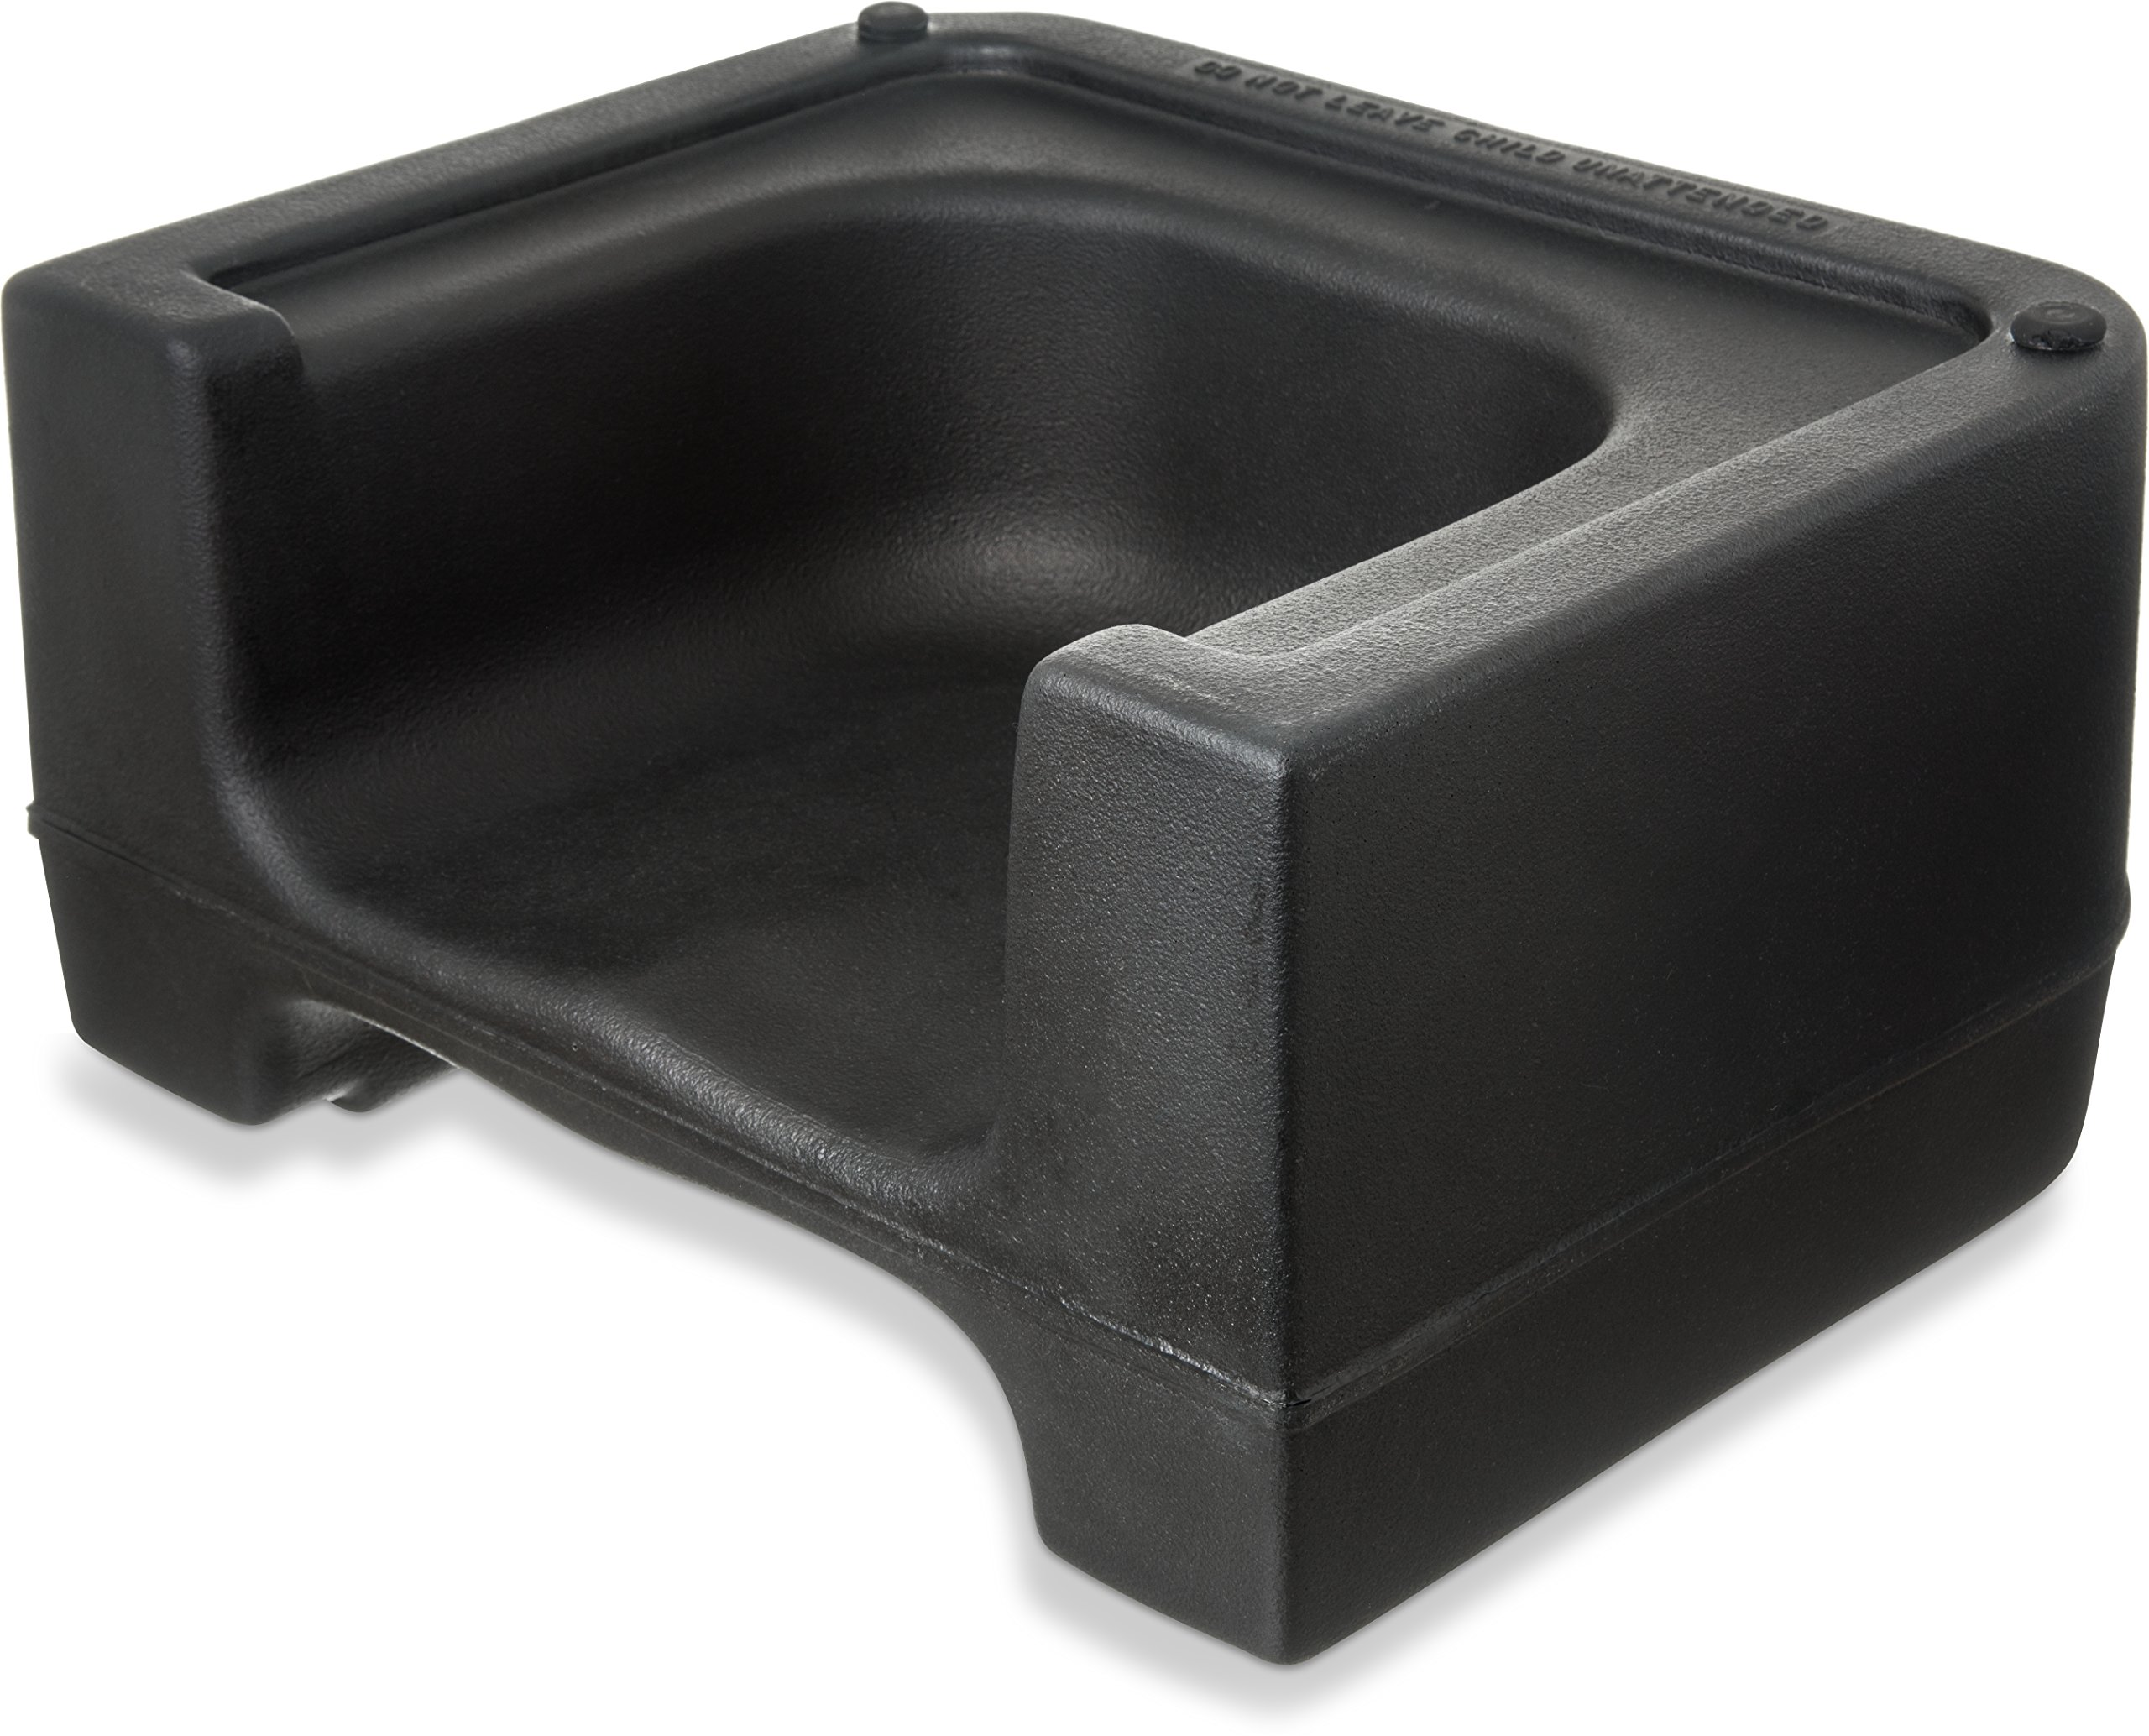 Carlisle 711003 Plastic Dual Seat Restaurant-Style Booster Chair, Black by Carlisle